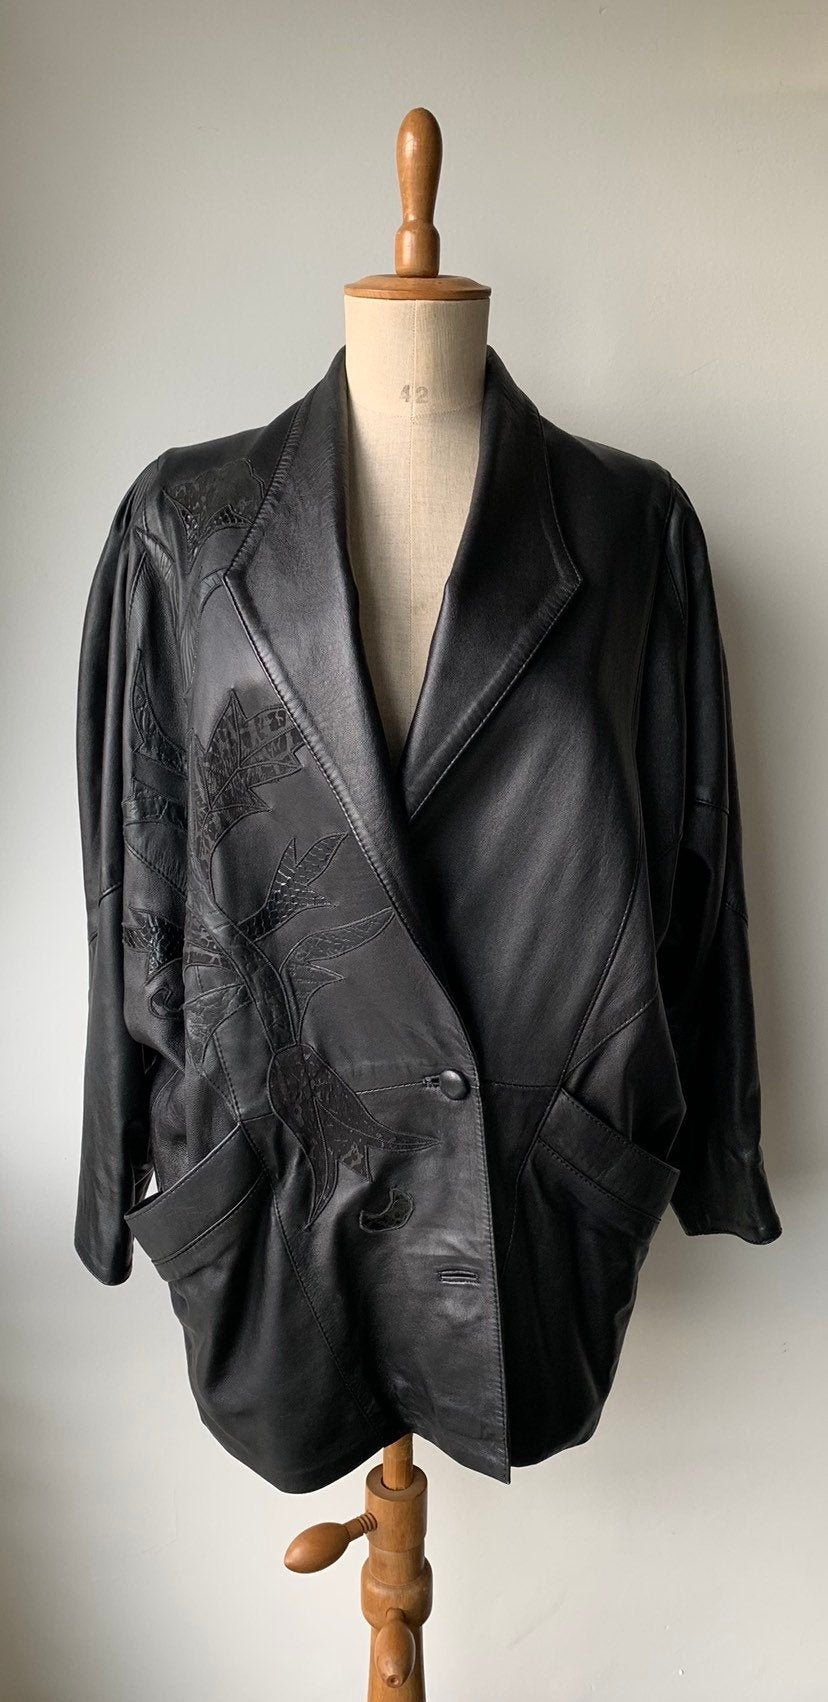 1980s Black Leather Oversized Jacket Bat Winged Sleeves With Etsy In 2020 Oversized Jacket Vintage Leather Jacket Vintage Clothes Shop